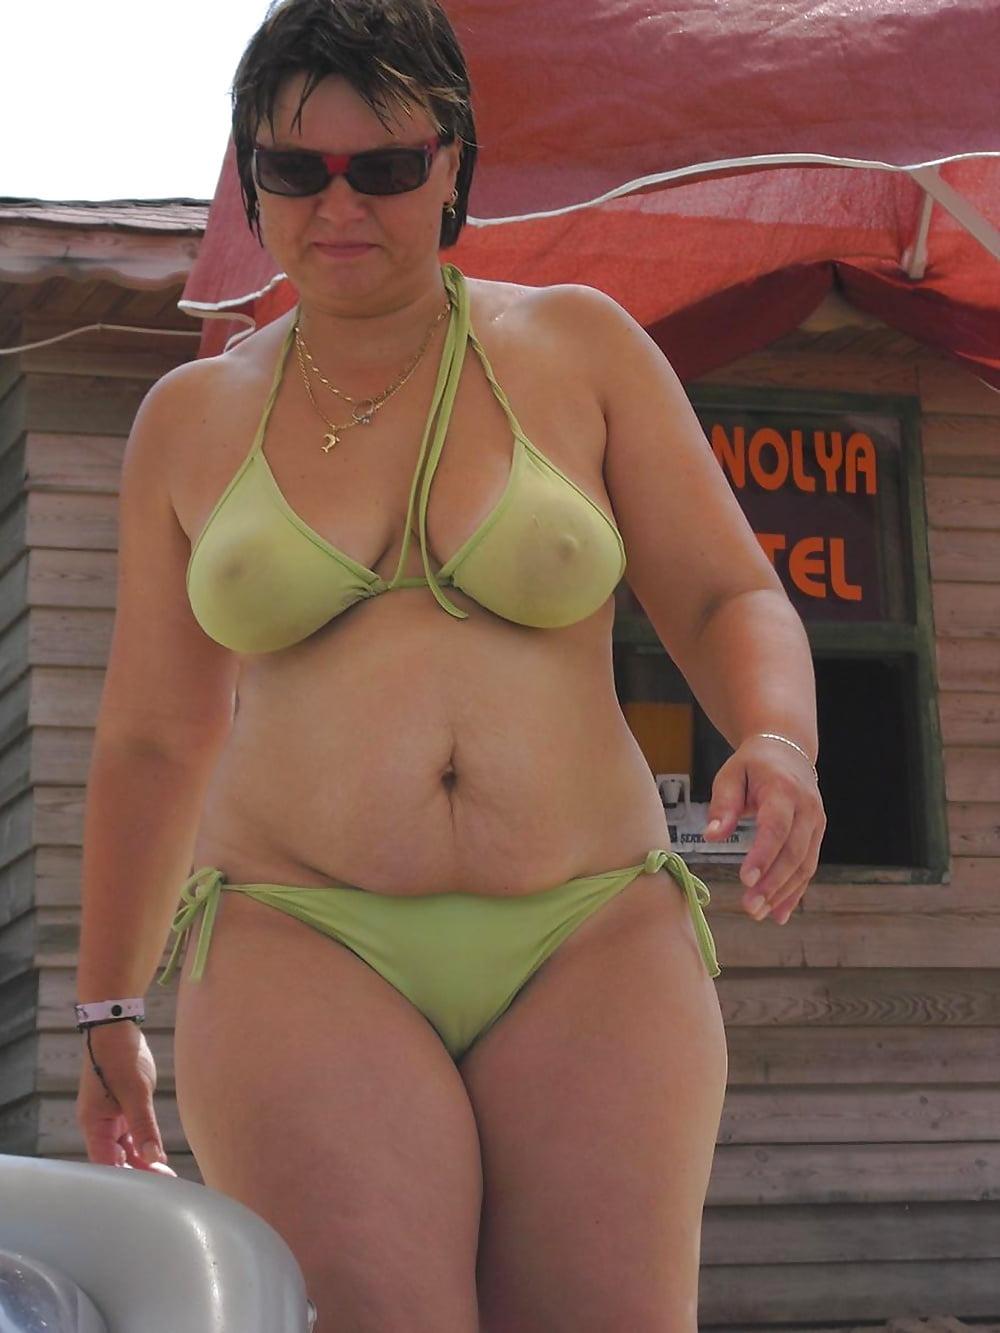 Nice 153 (chubby bikini) - 178 Pics | xHamster